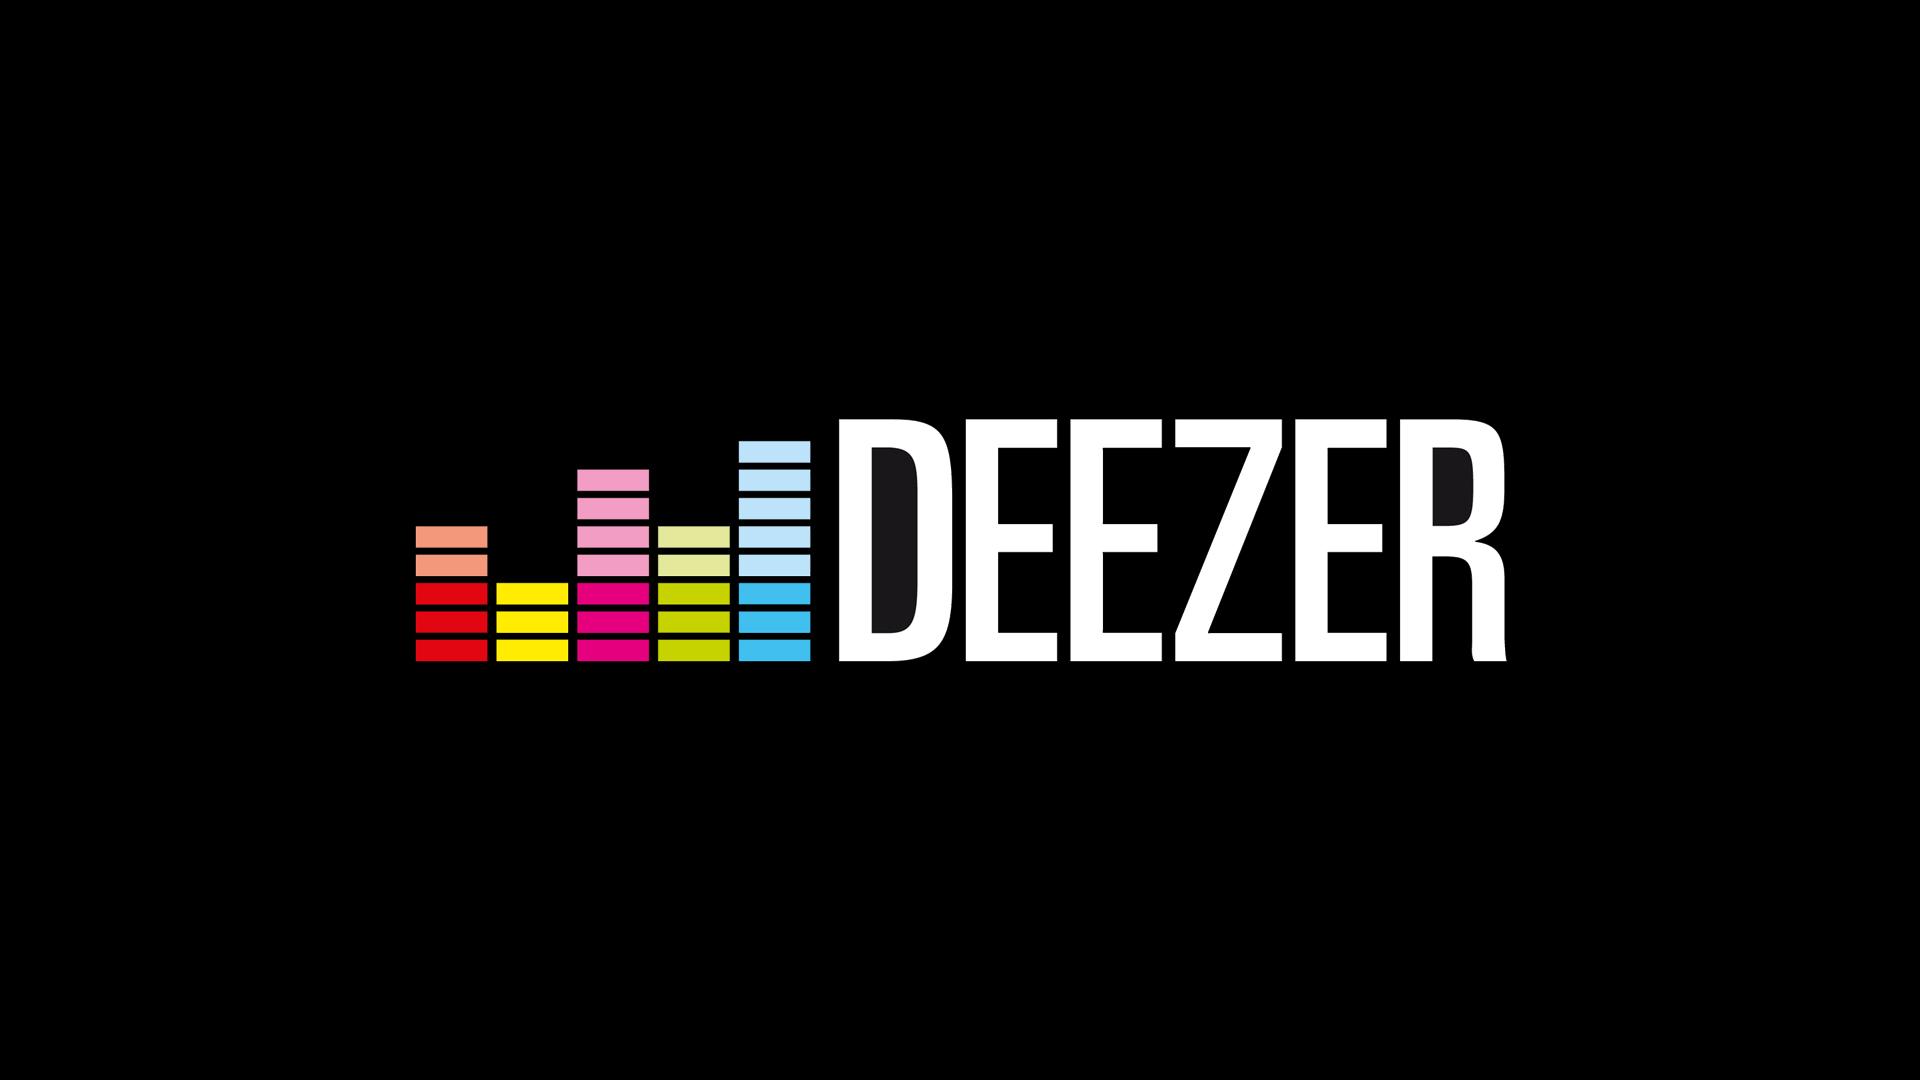 Deezer s'exporte aux Etats-Unis